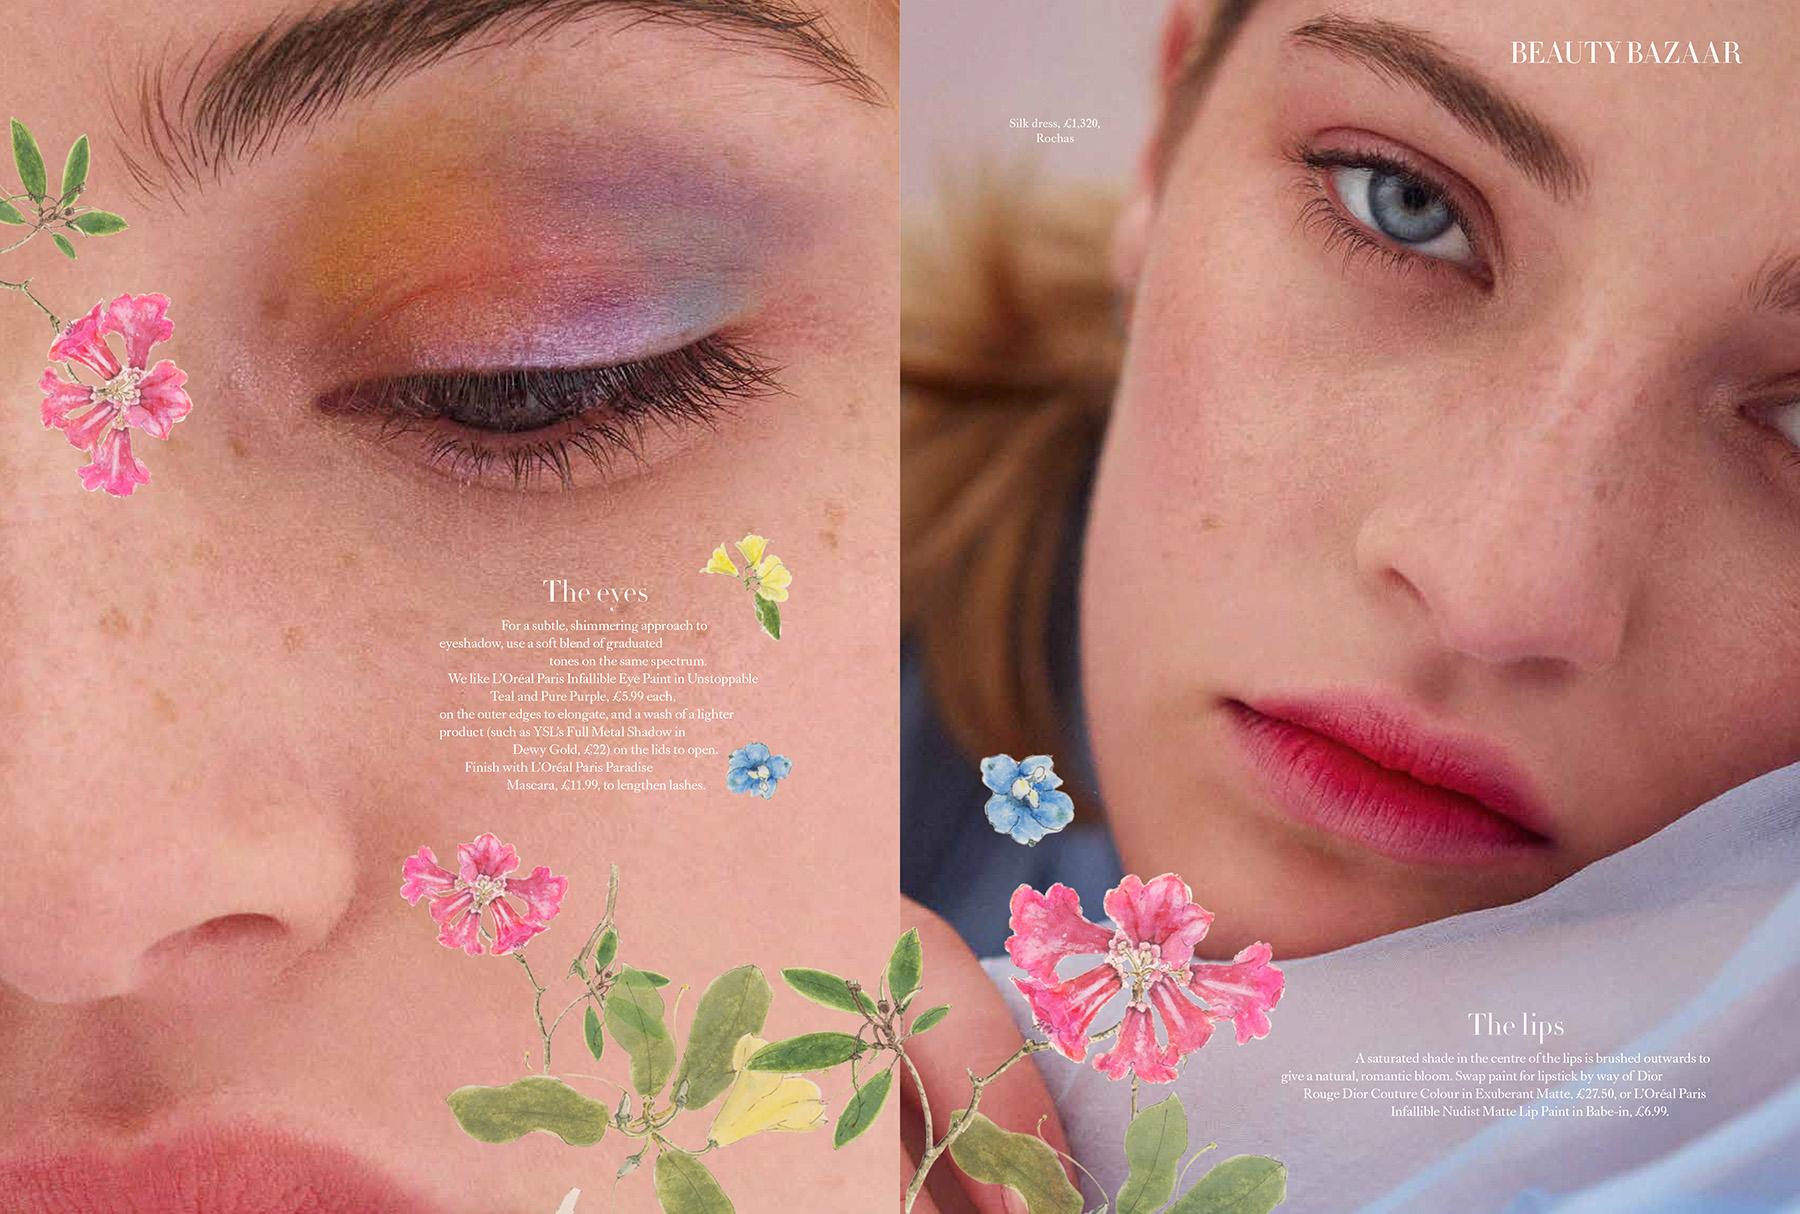 003-icon-artist-management-Kristin-Vicari-Beauty-Harpers Bazaar 3.jpg